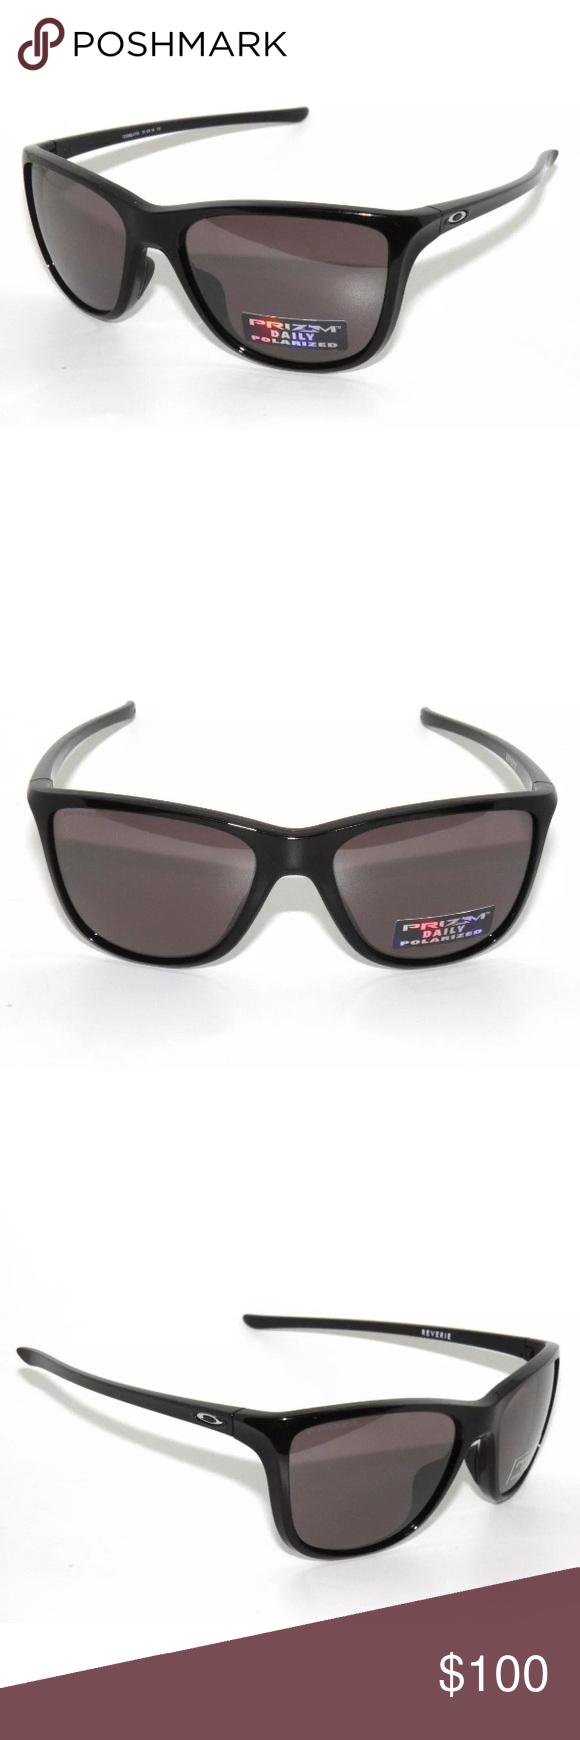 8a09b0ed1730f Oakley Reverie 9362-07 Black Polarized Sunglasses